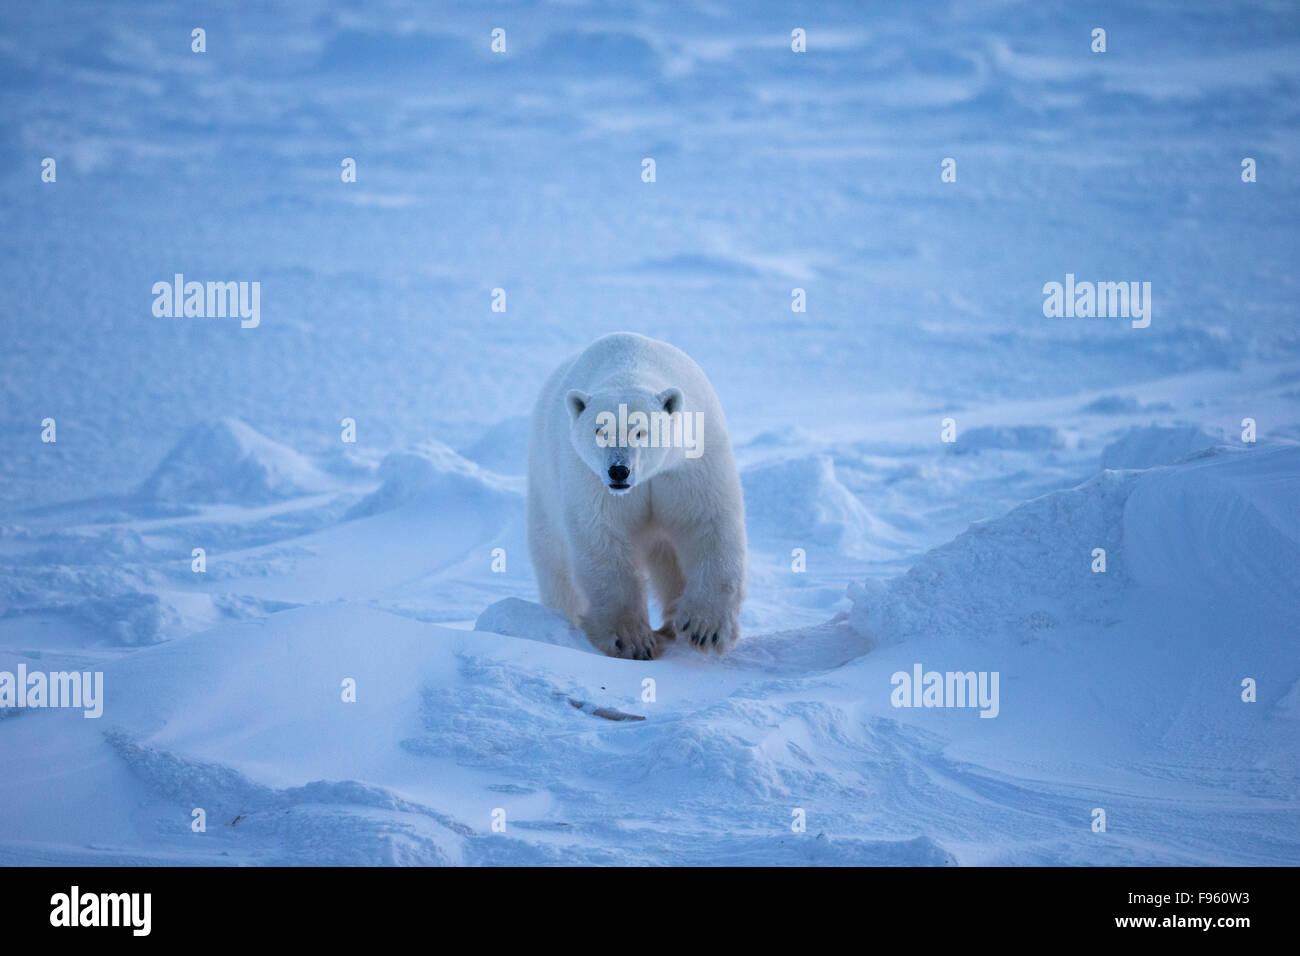 Polar bear (Ursus maritimus), Cape Churchill, Wapusk National Park, Manitoba. - Stock Image